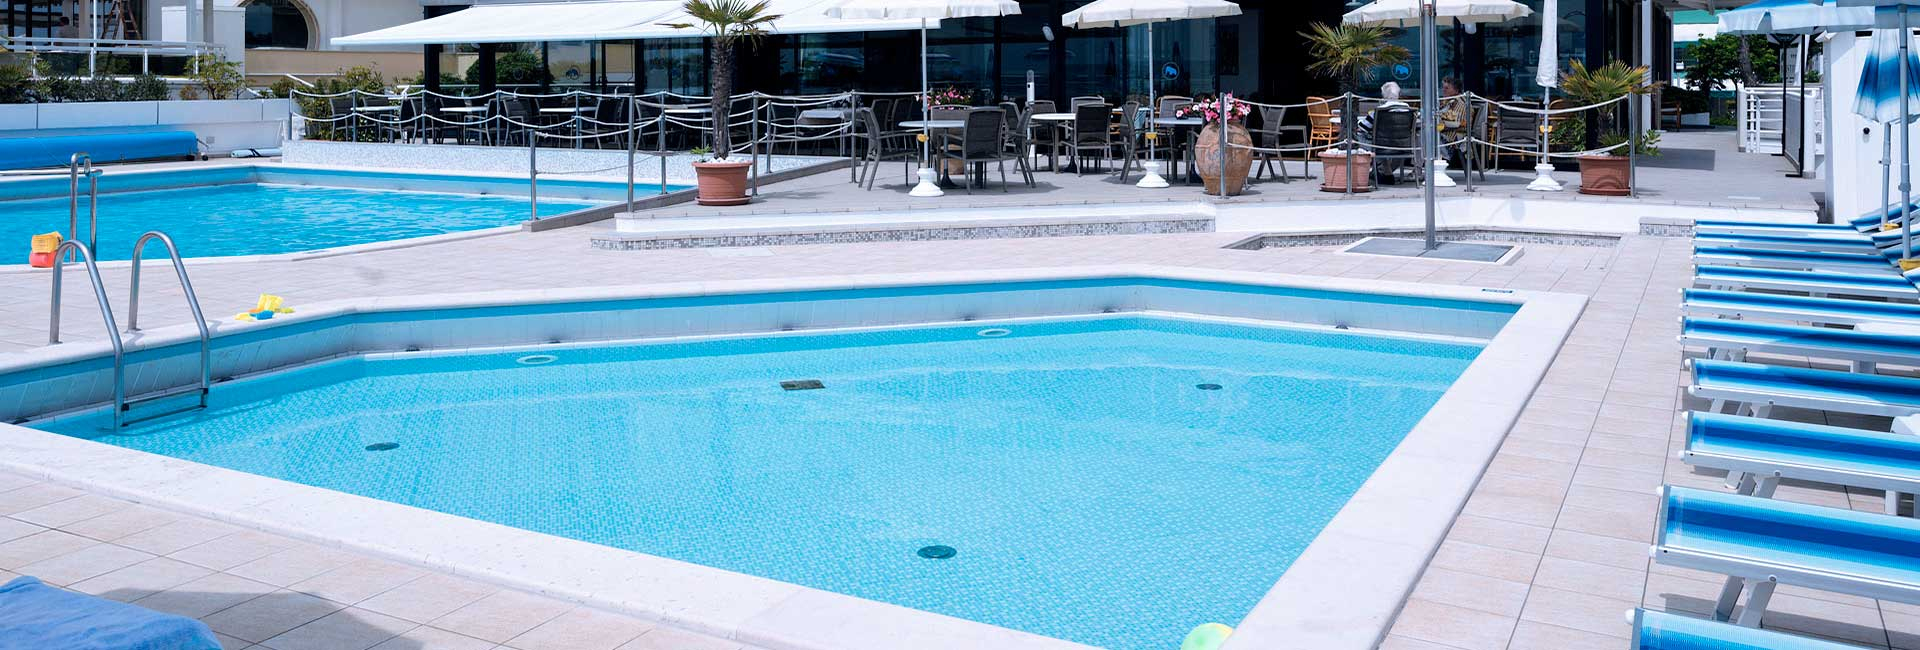 Hotel 4 Etoiles À Jesolo Lido - Hotel Bristol concernant Piscine Du Lido